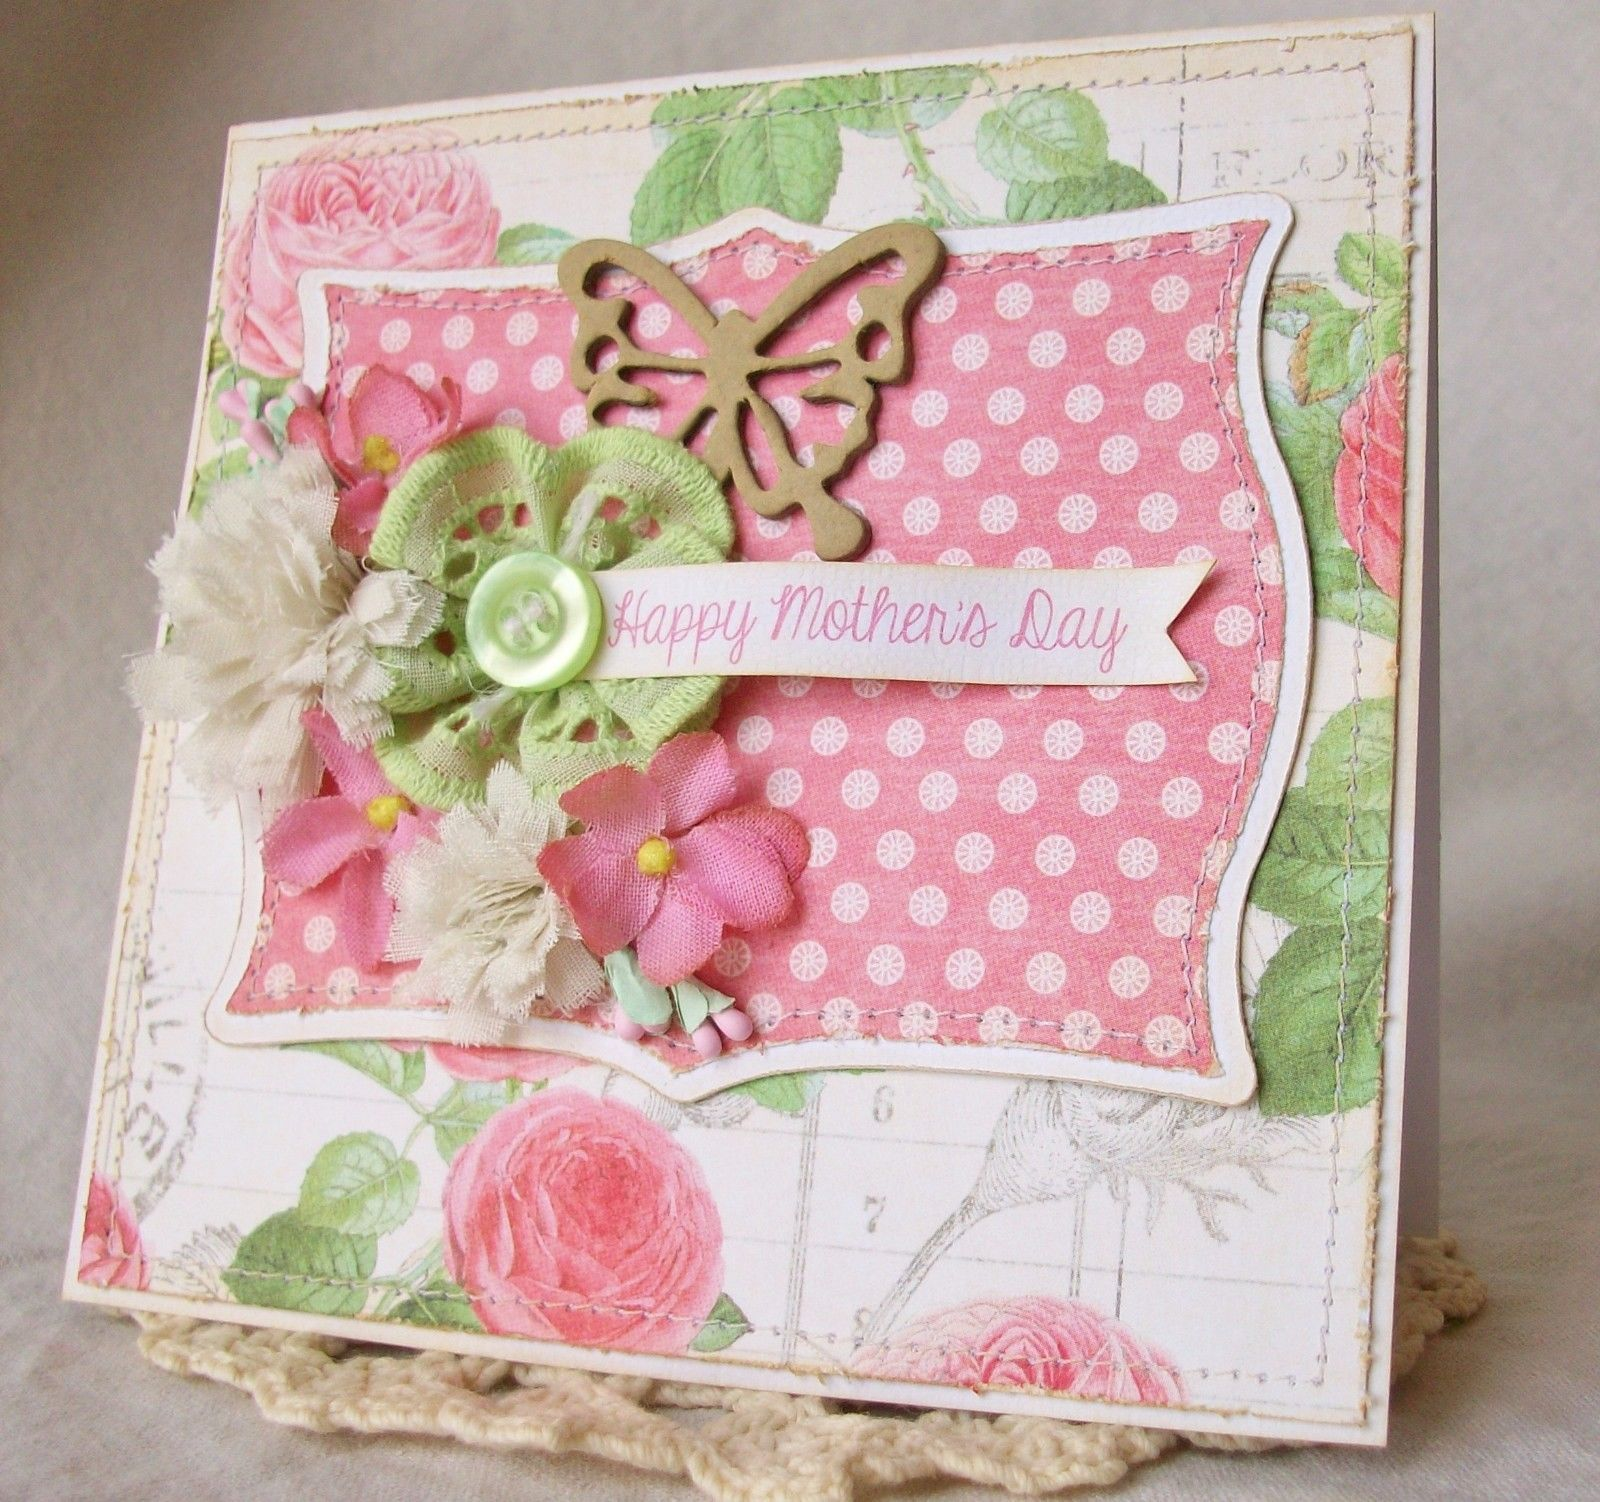 Handmade Mothers Day Card 4 Ocbrandy TPHH Greeting Keepsake Fabric Flowers G45